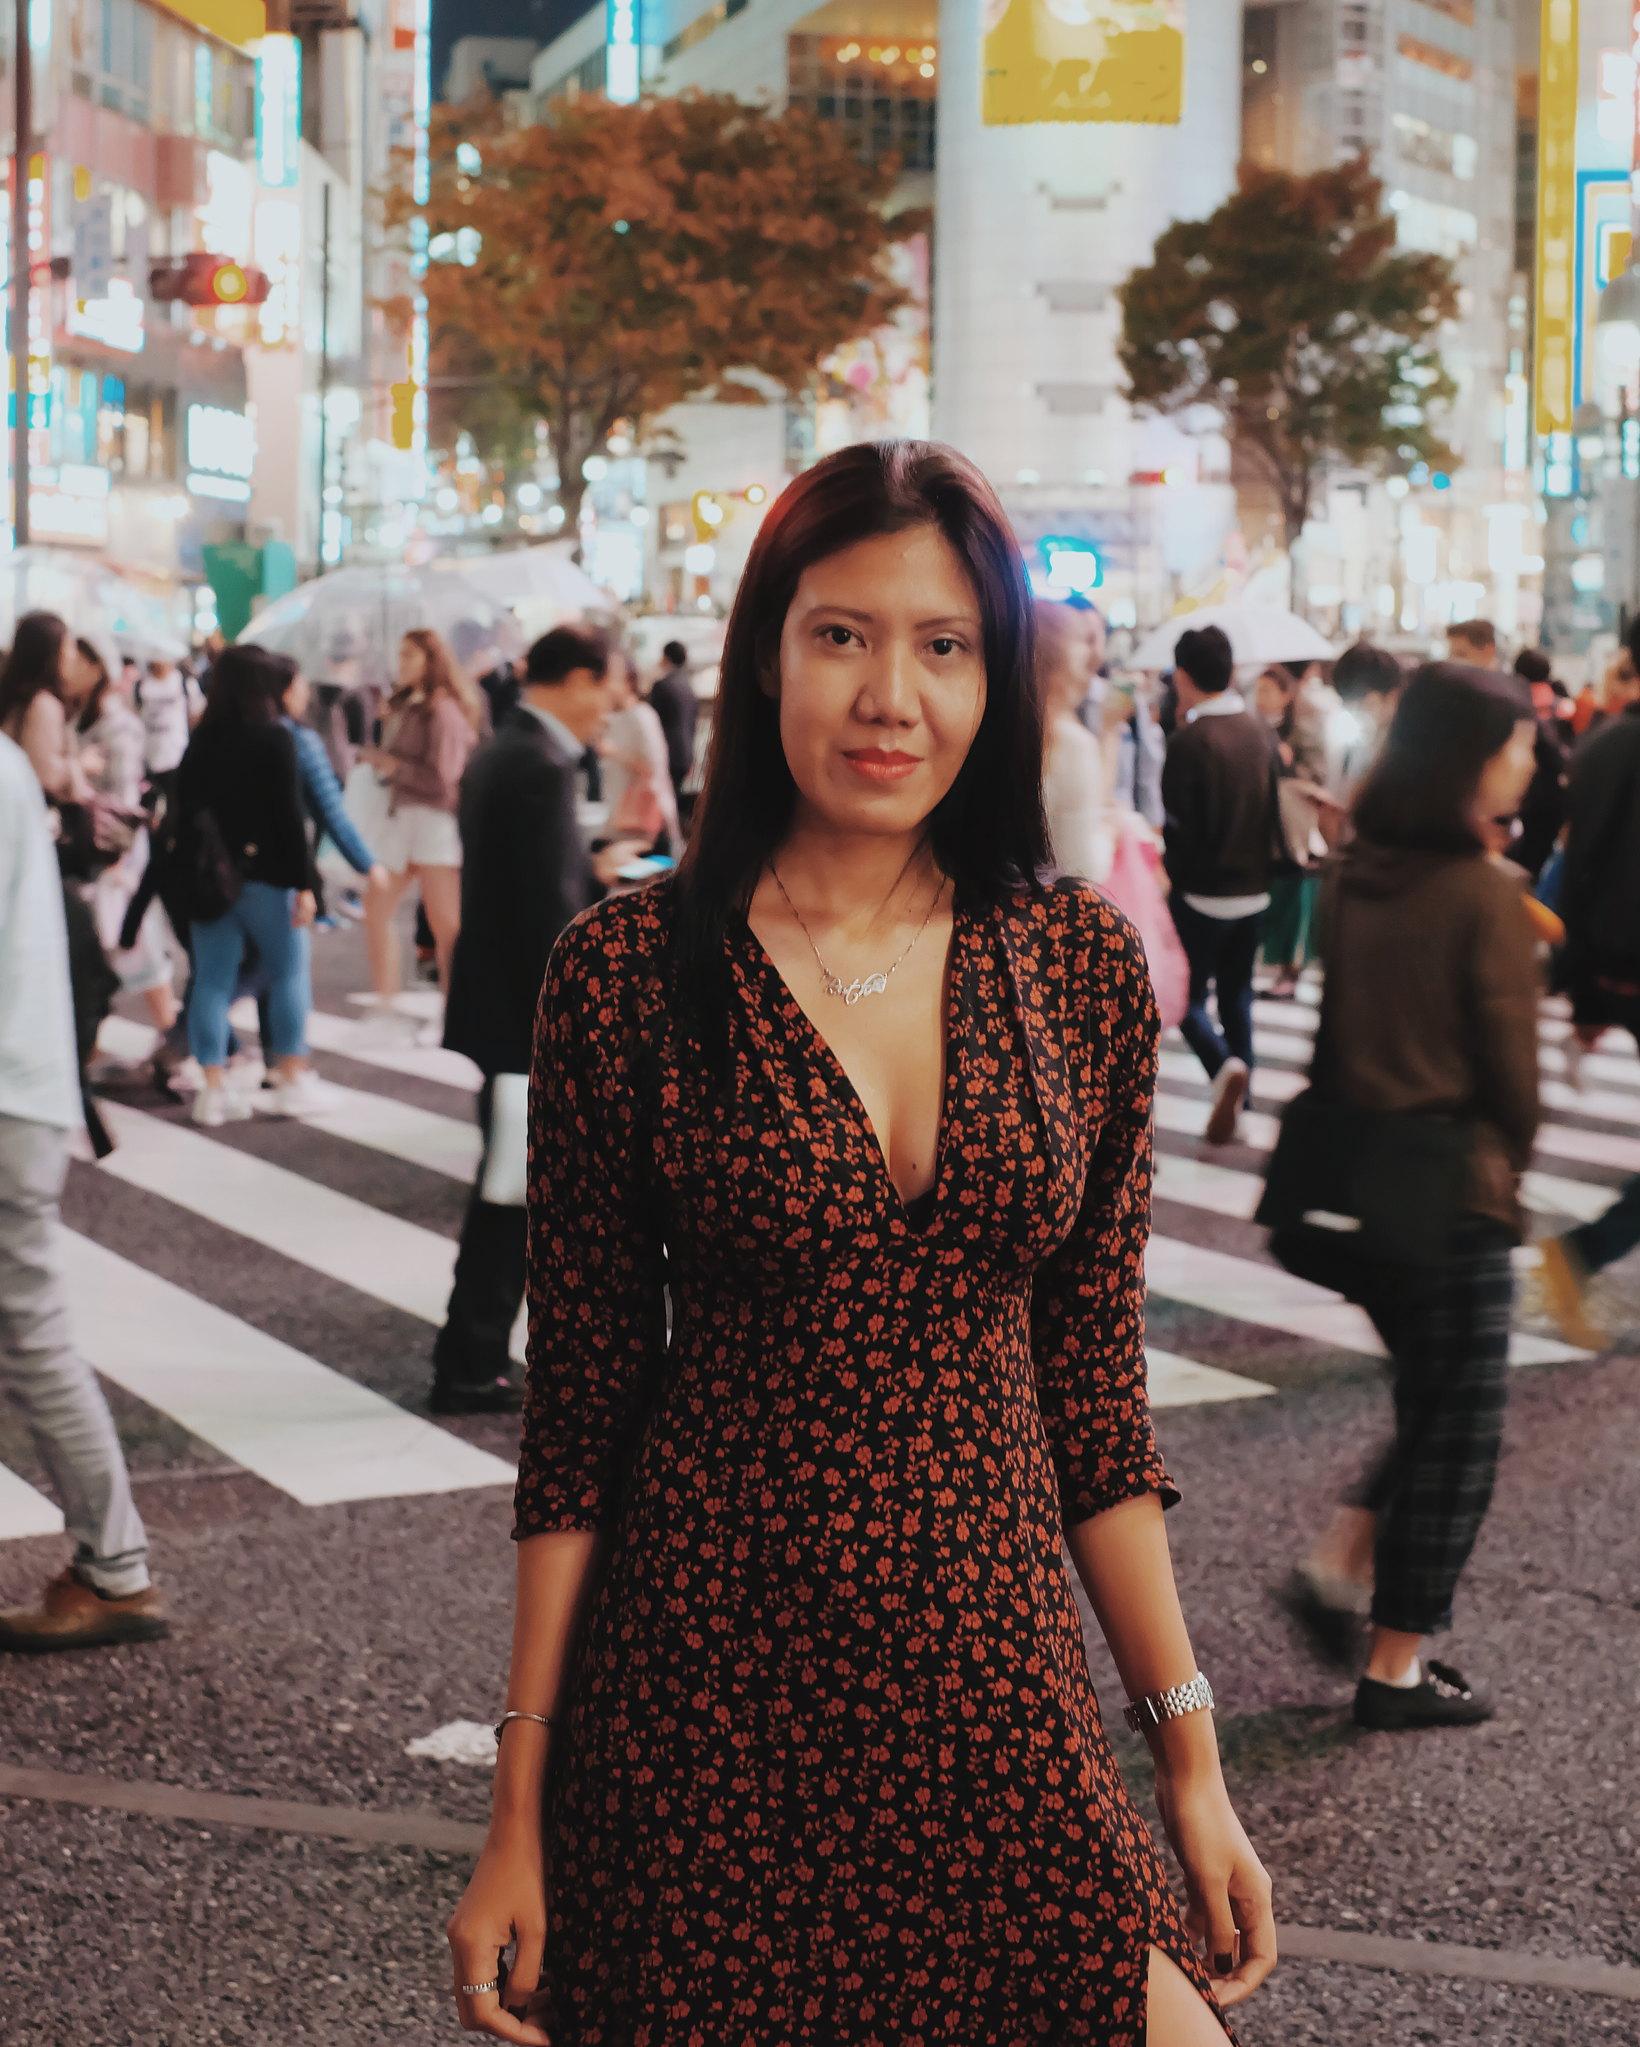 tokyo travel guide 2019 shibuya crossing